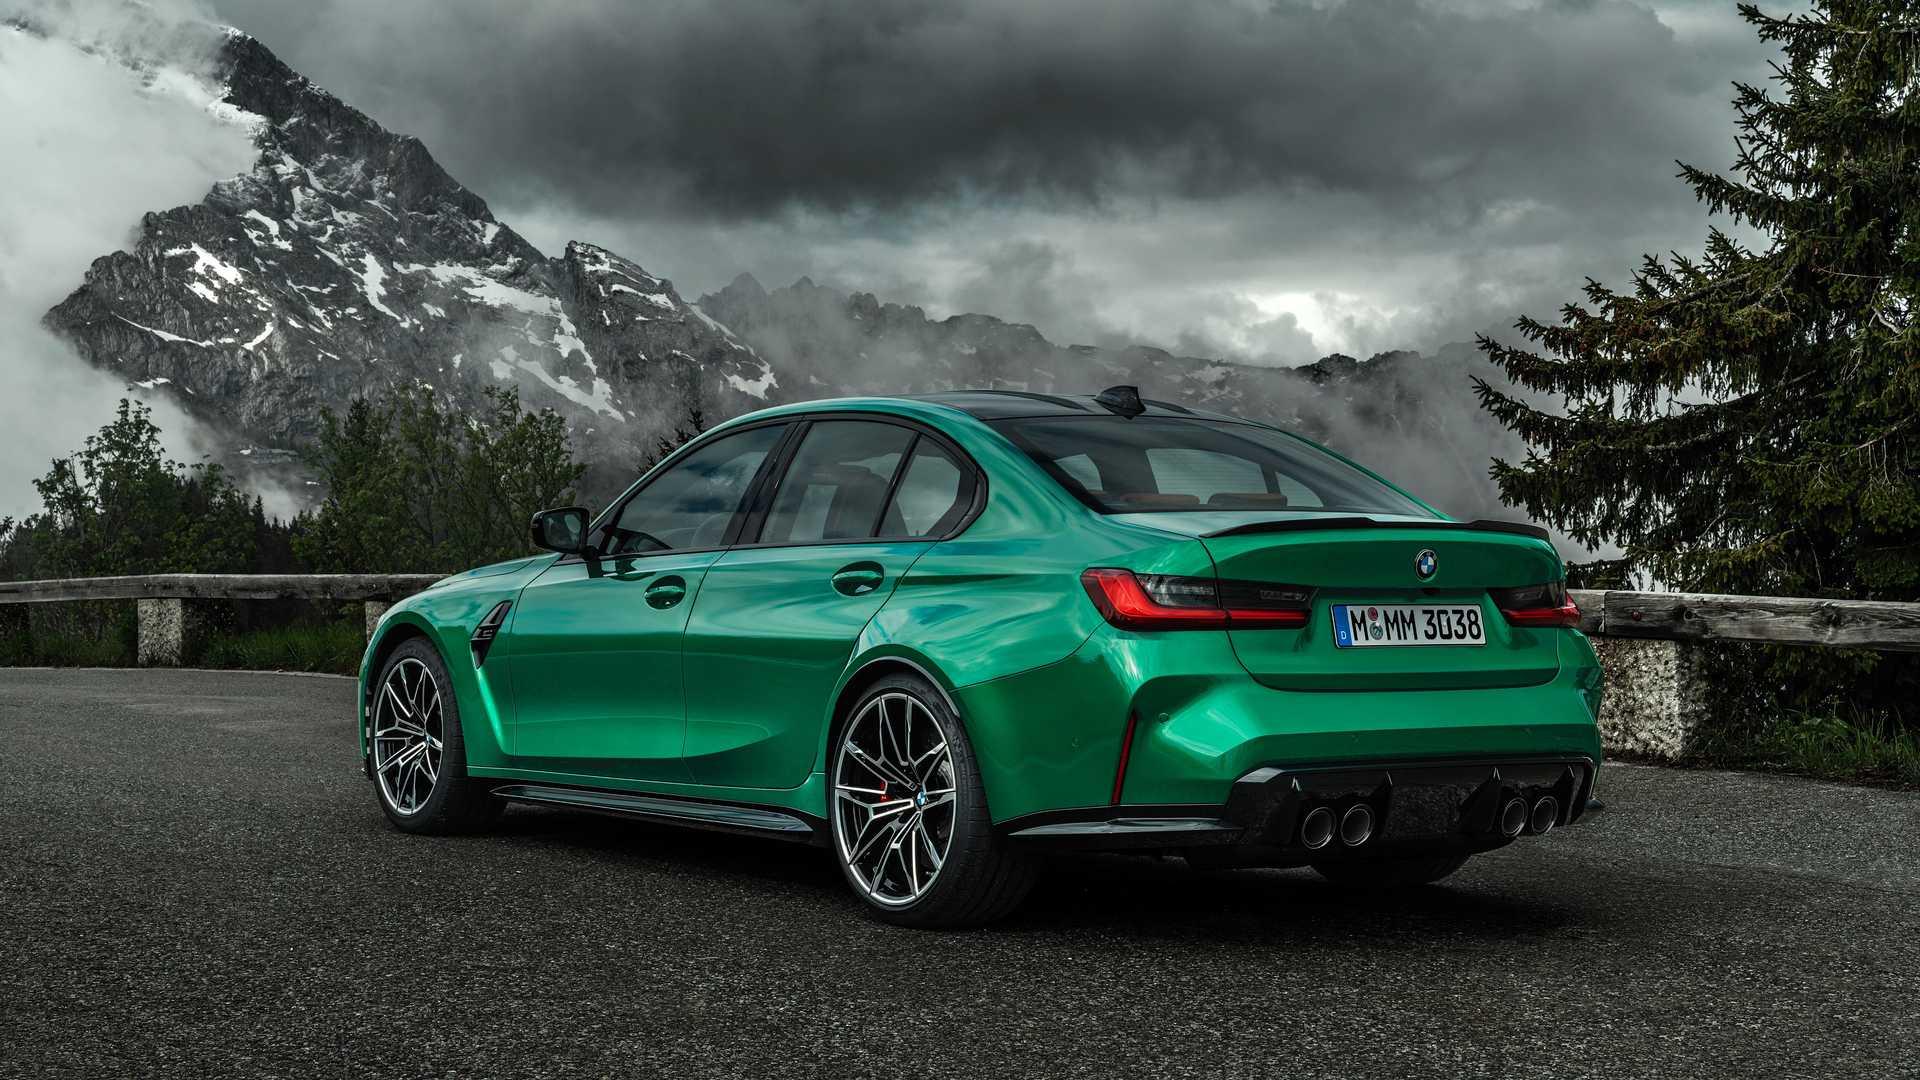 2021 BMW M3 Price